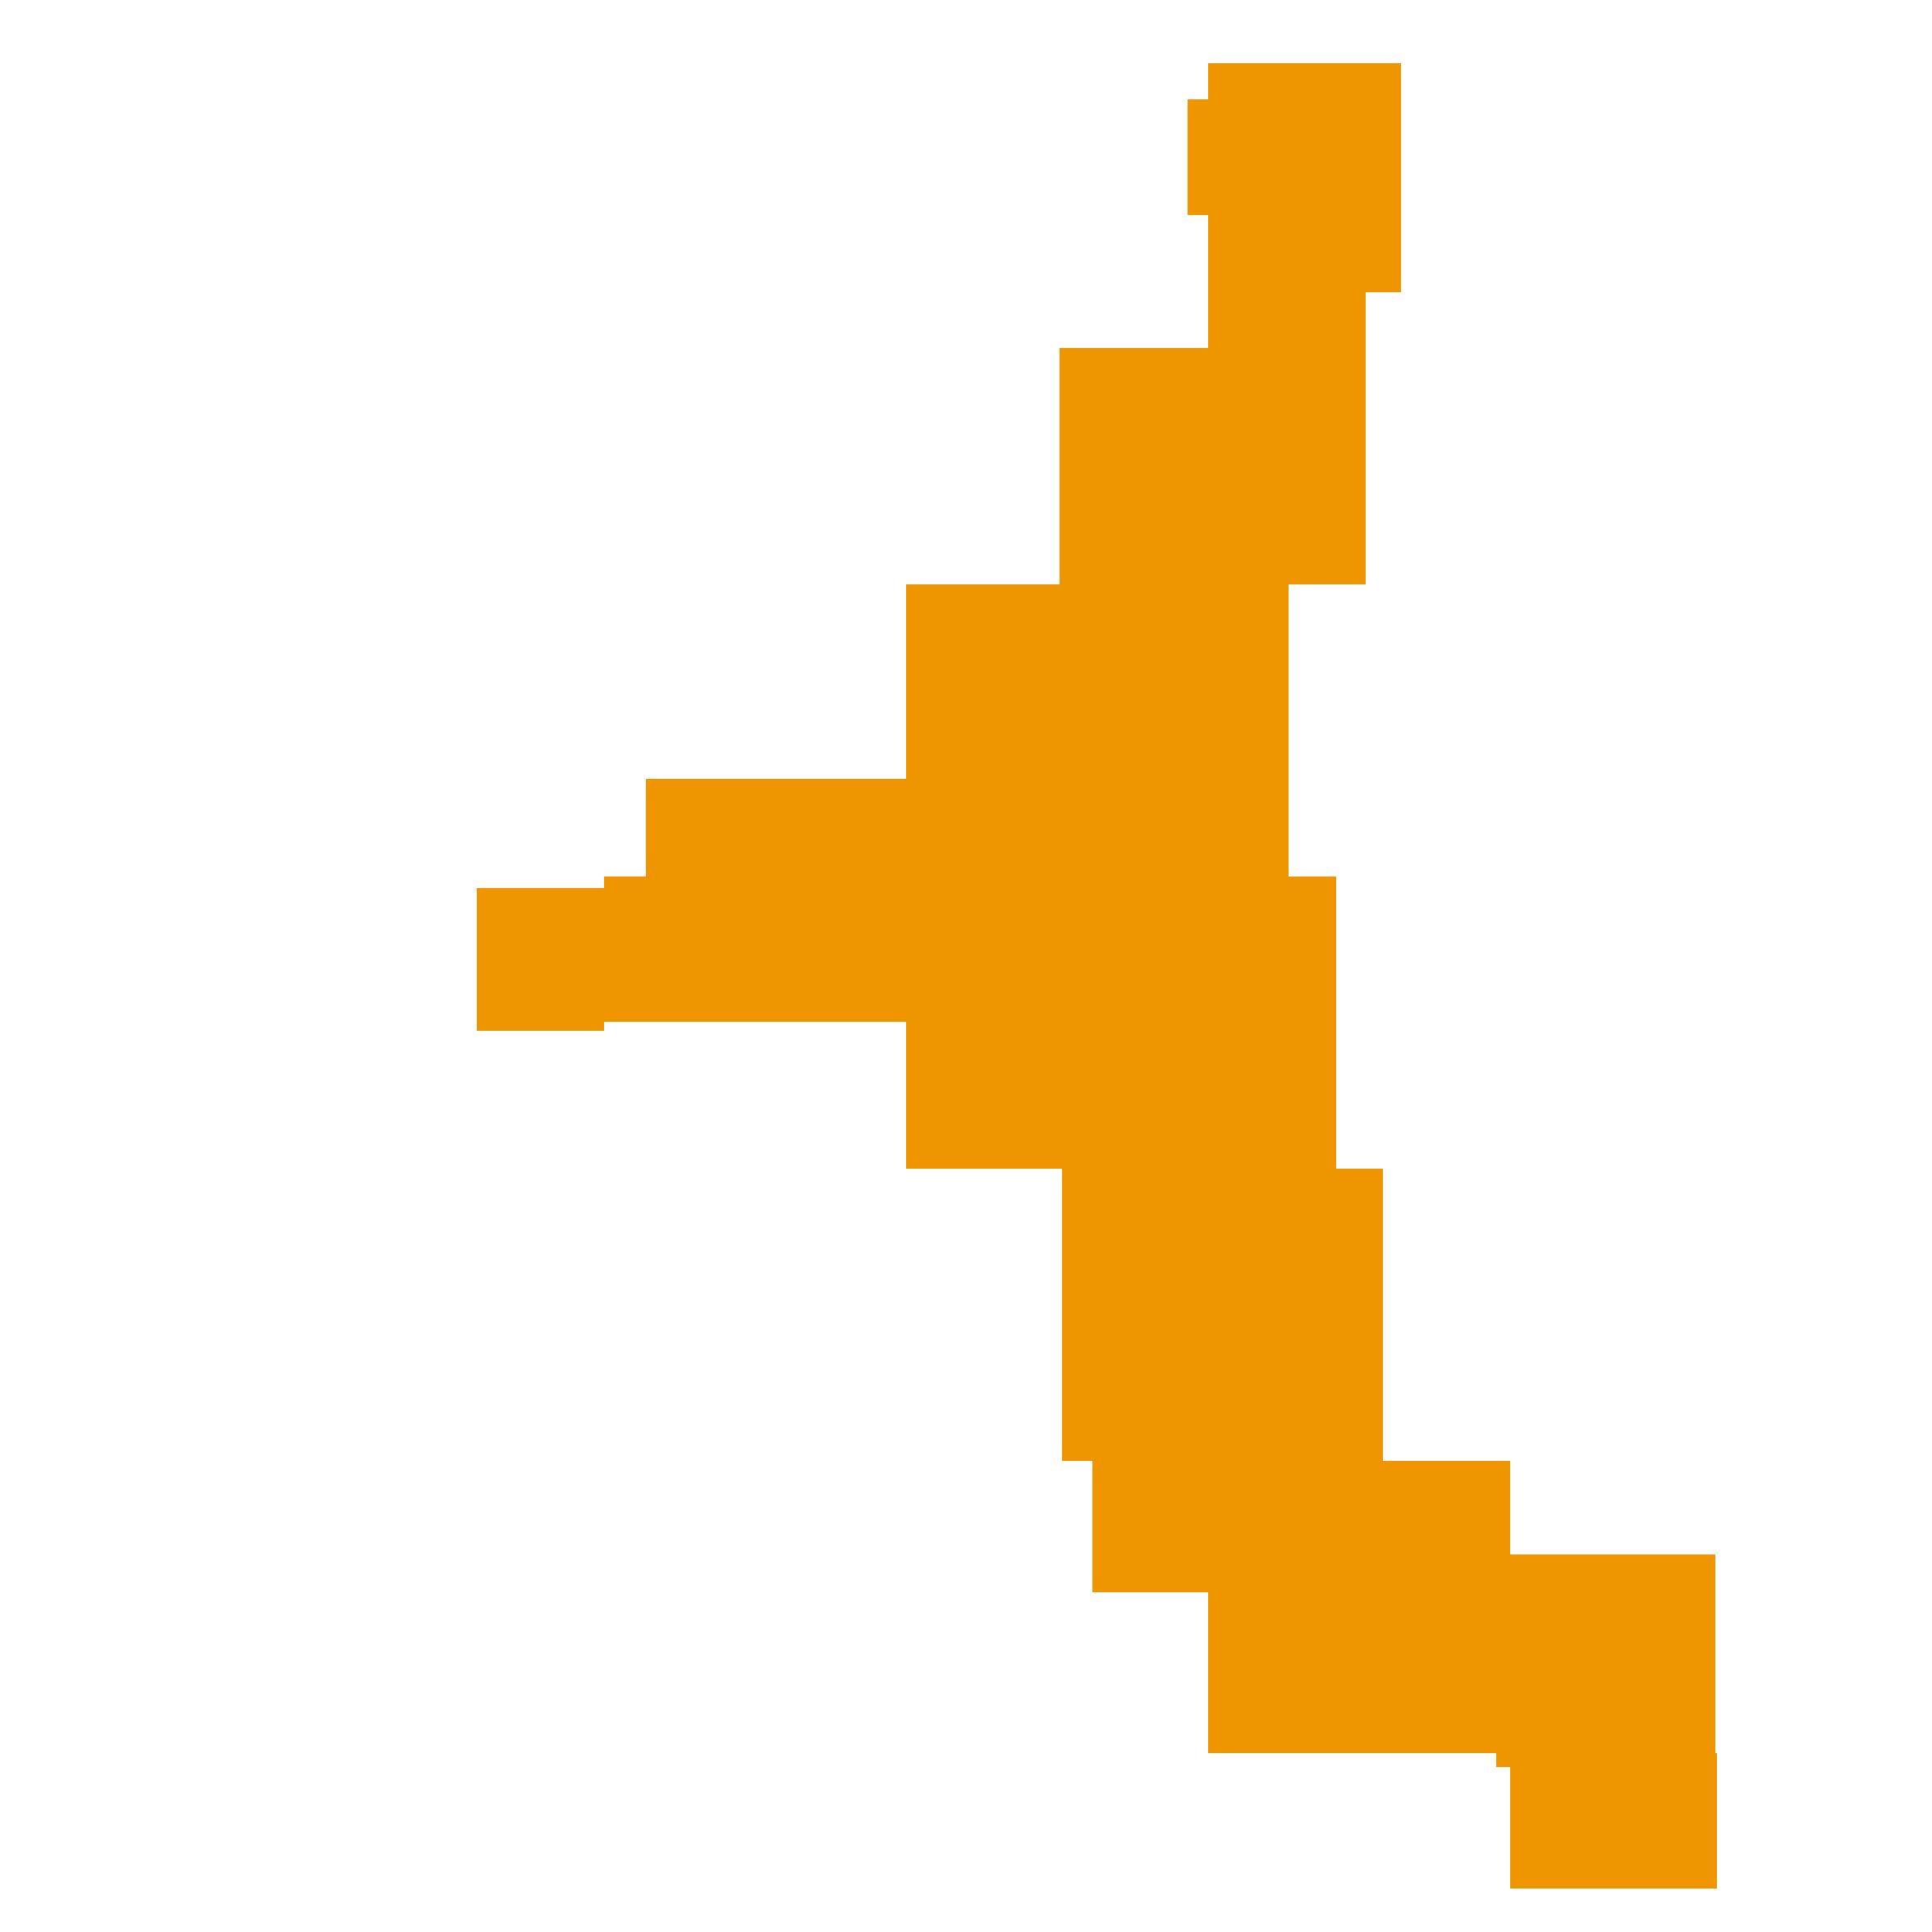 2354x2354 Basketball Player Slam Dunk Wall Decal Athlete